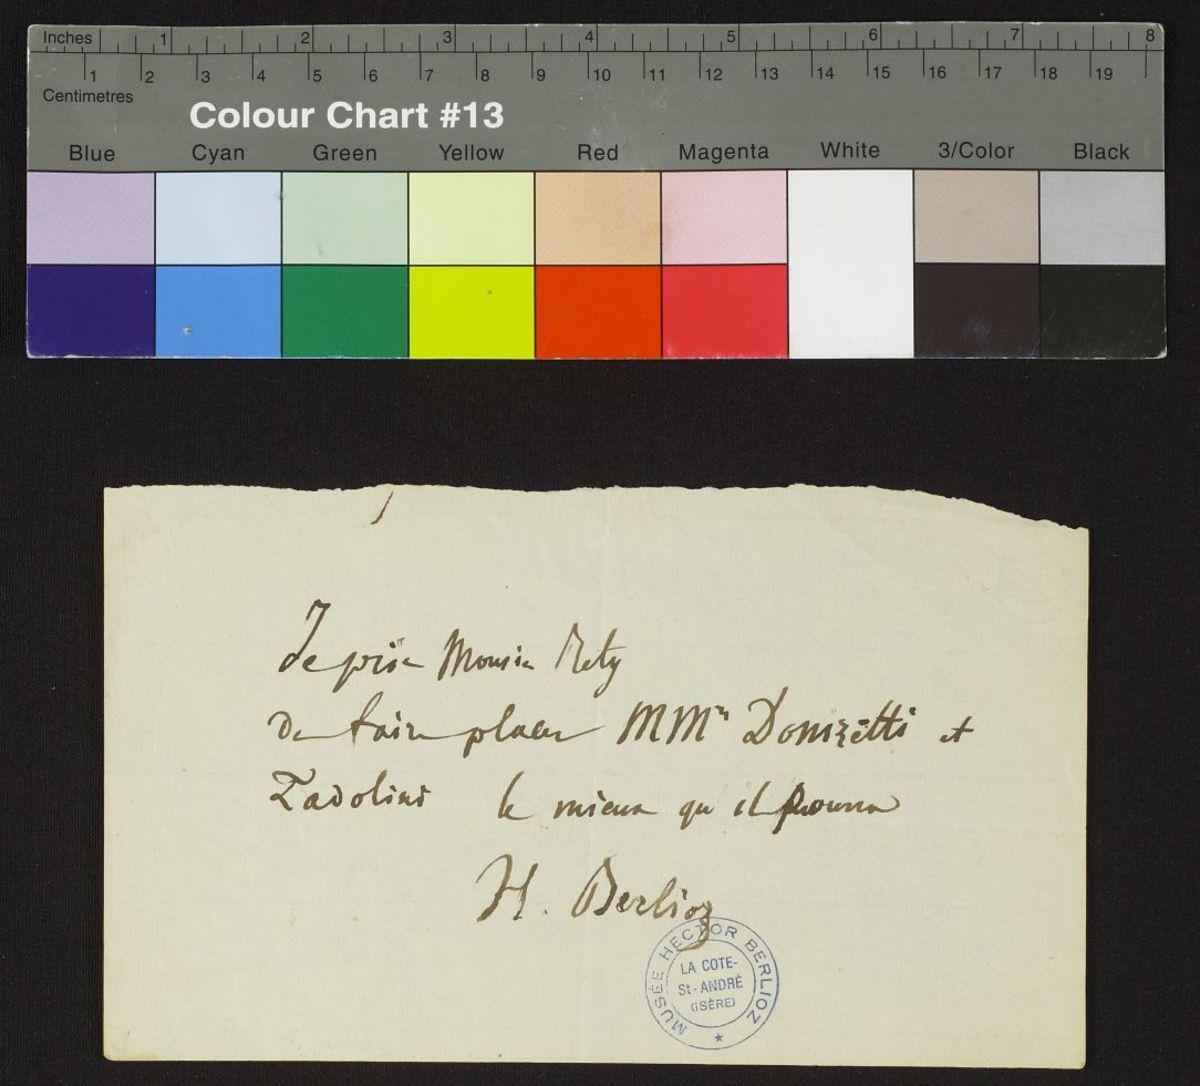 Lettre d'Hector Berlioz à Rety Manuscrit